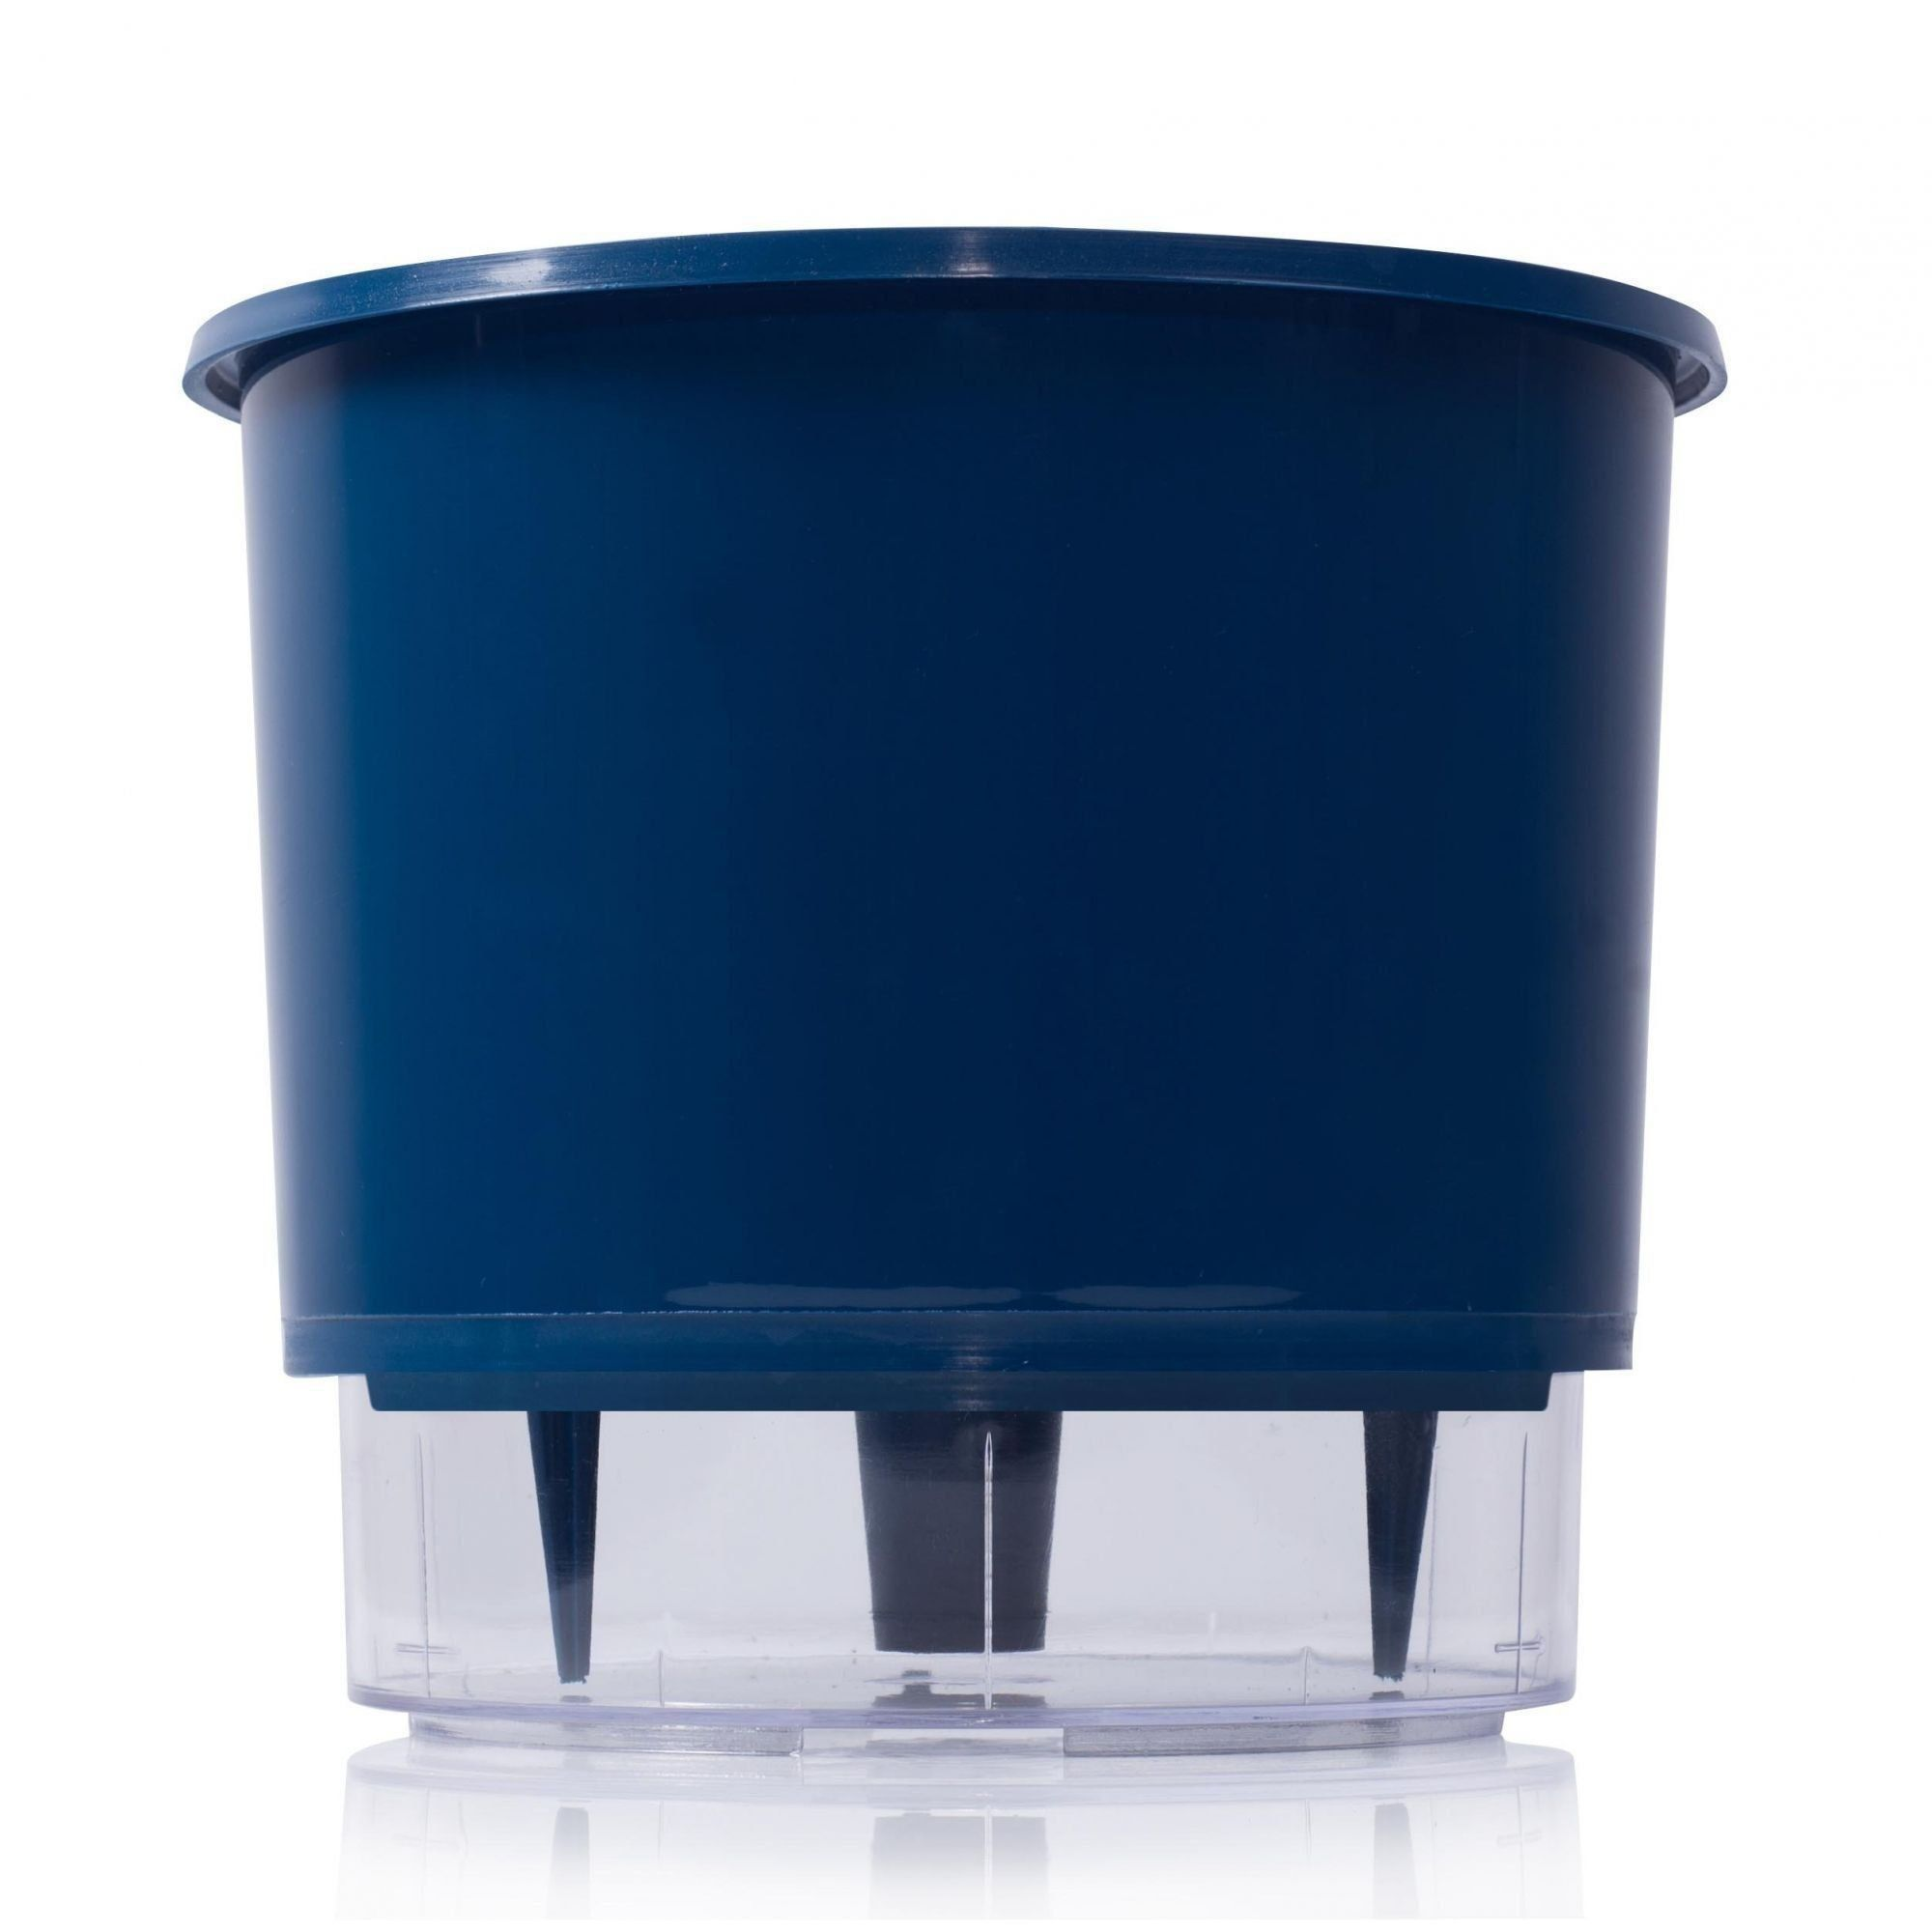 Vaso Autoirrigável 02 Azul Escuro